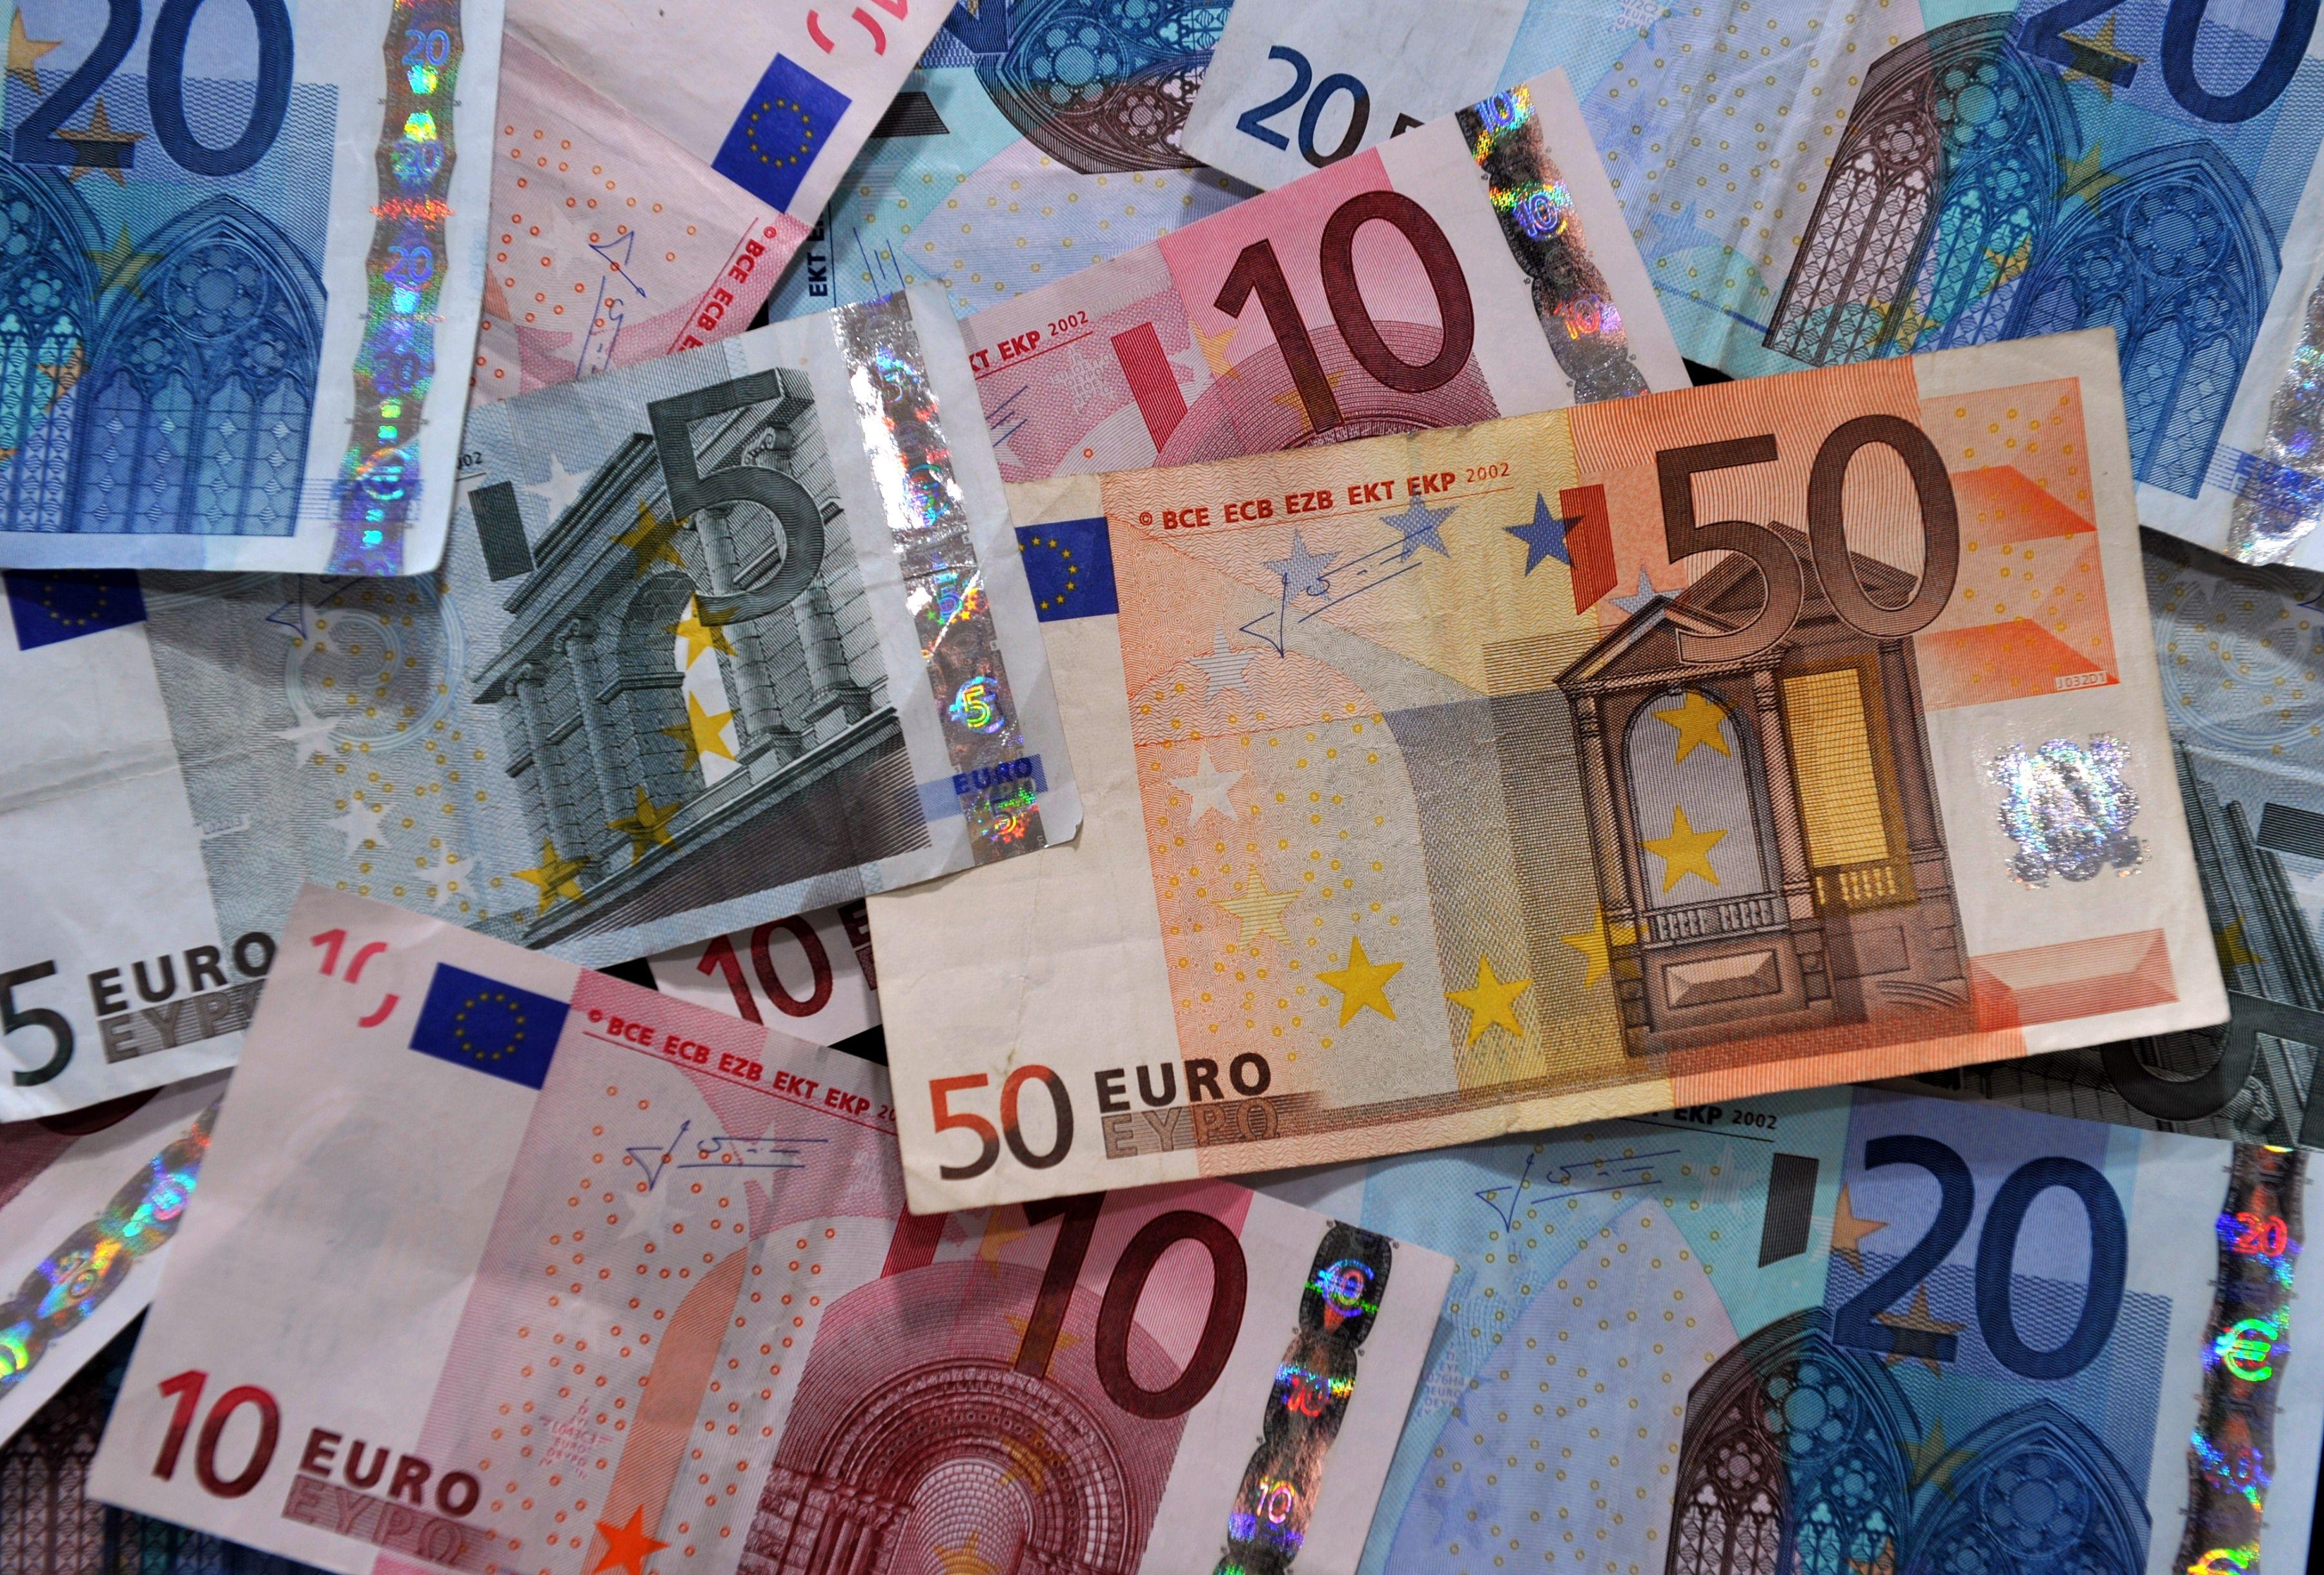 Comment l'Allemagne finance l'Europe du Sud